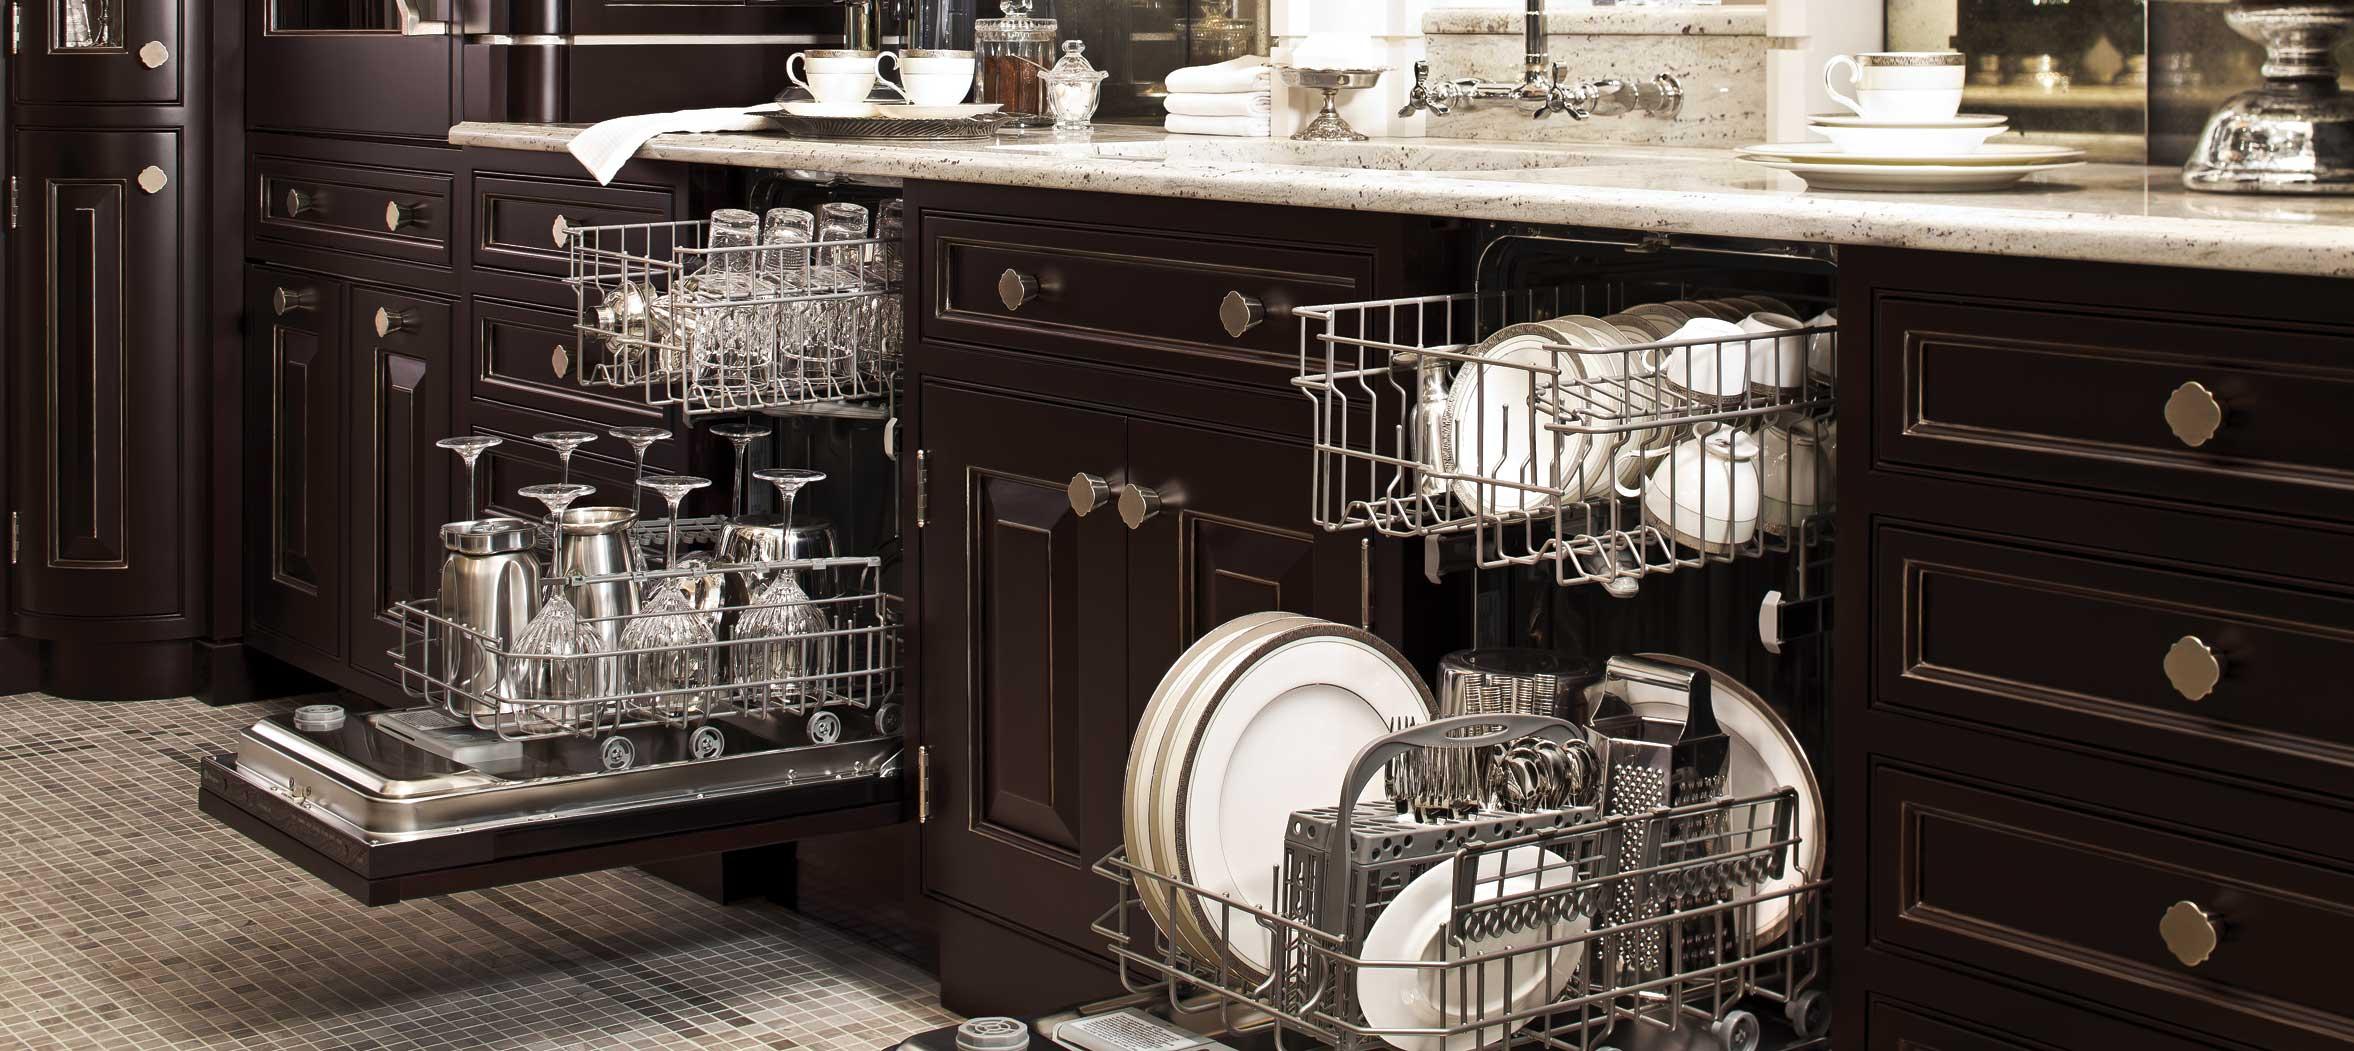 15-two-dishwashers